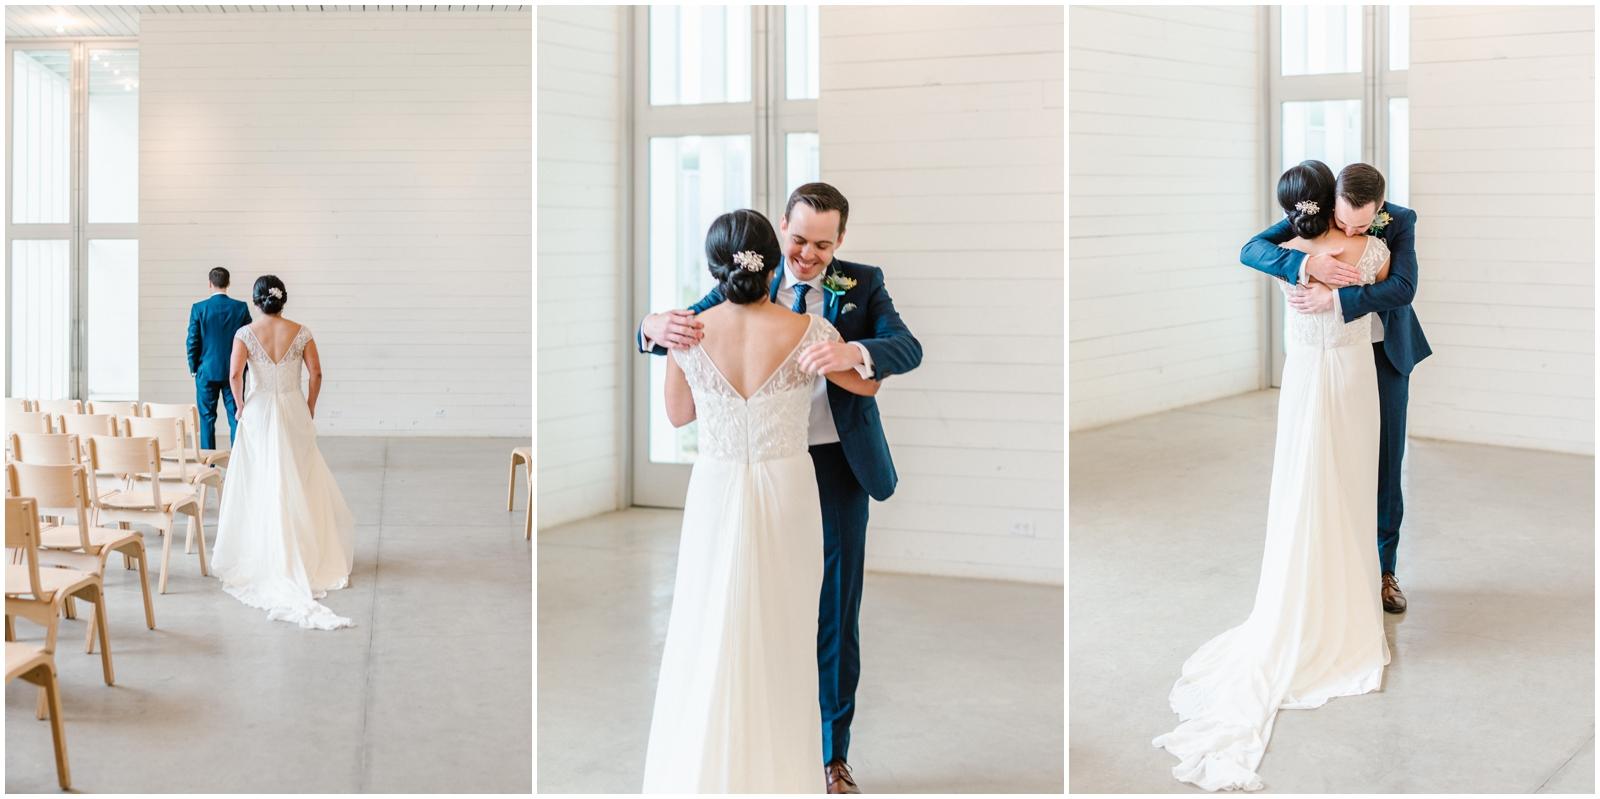 Minimalistic TX Venue Prosper House -Austin Wedding Planner_0336.jpg